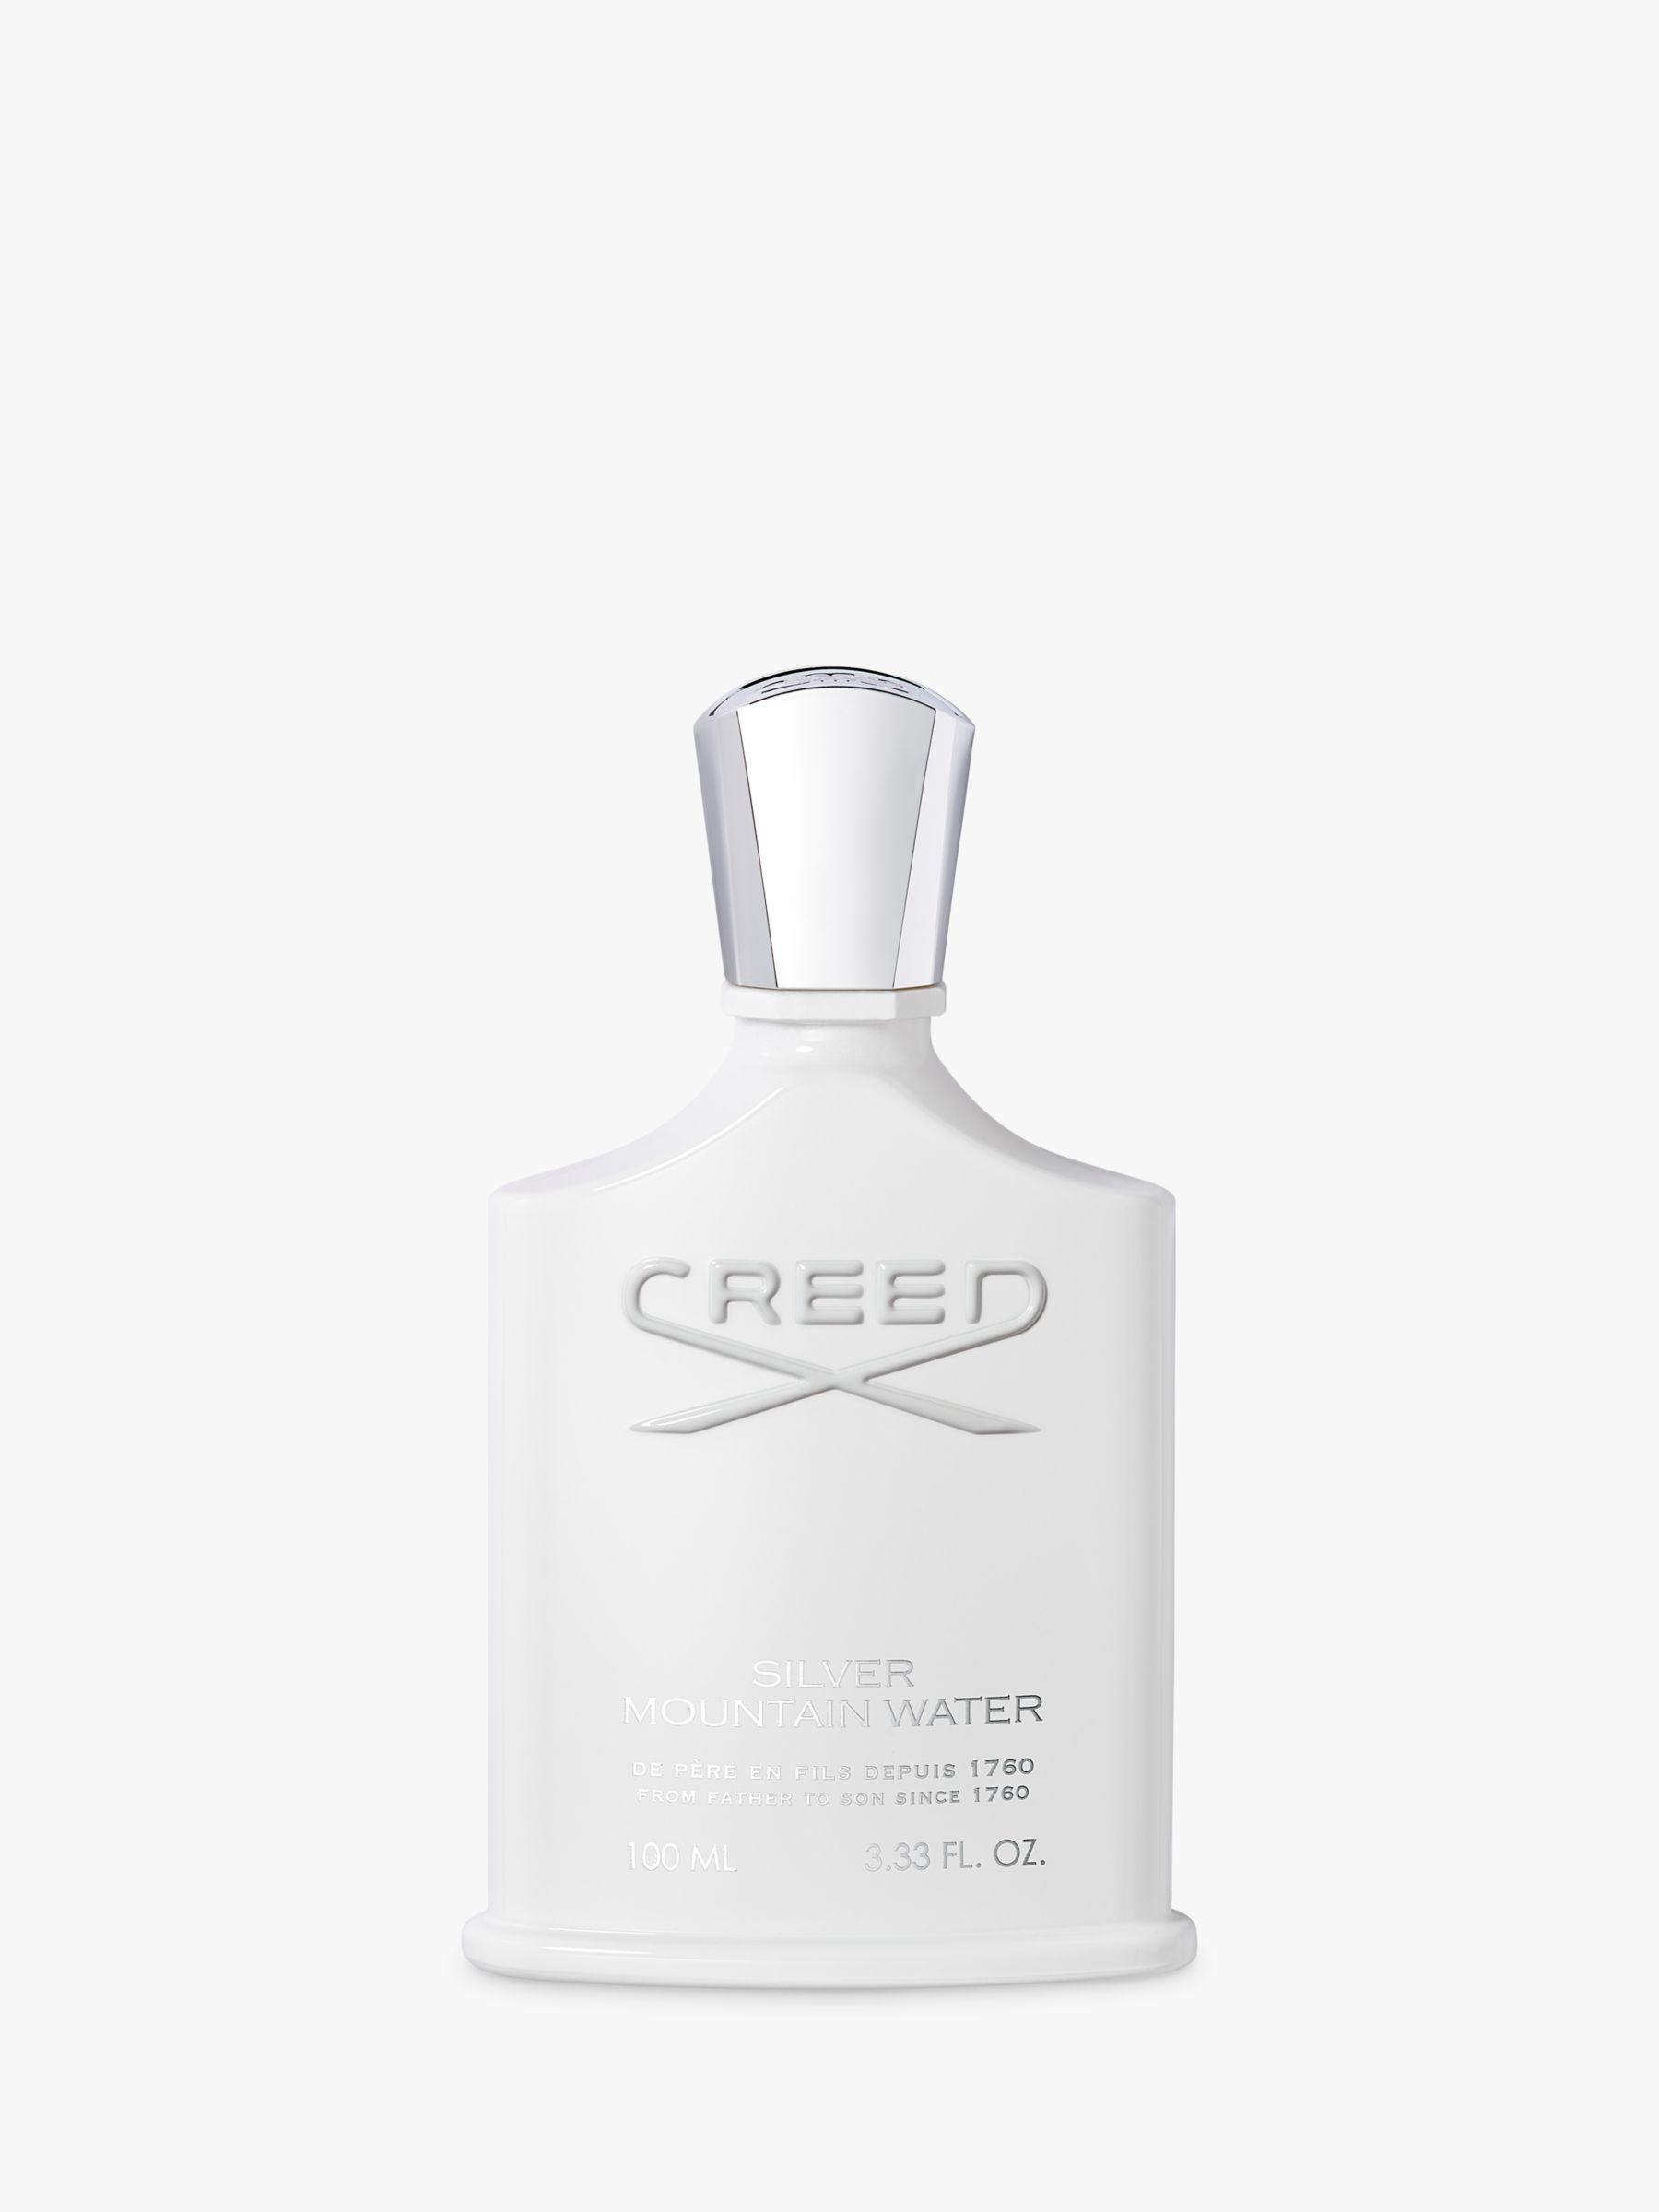 c7ede1a7b8 CREED Silver Mountain Water Eau de Parfum, 100ml